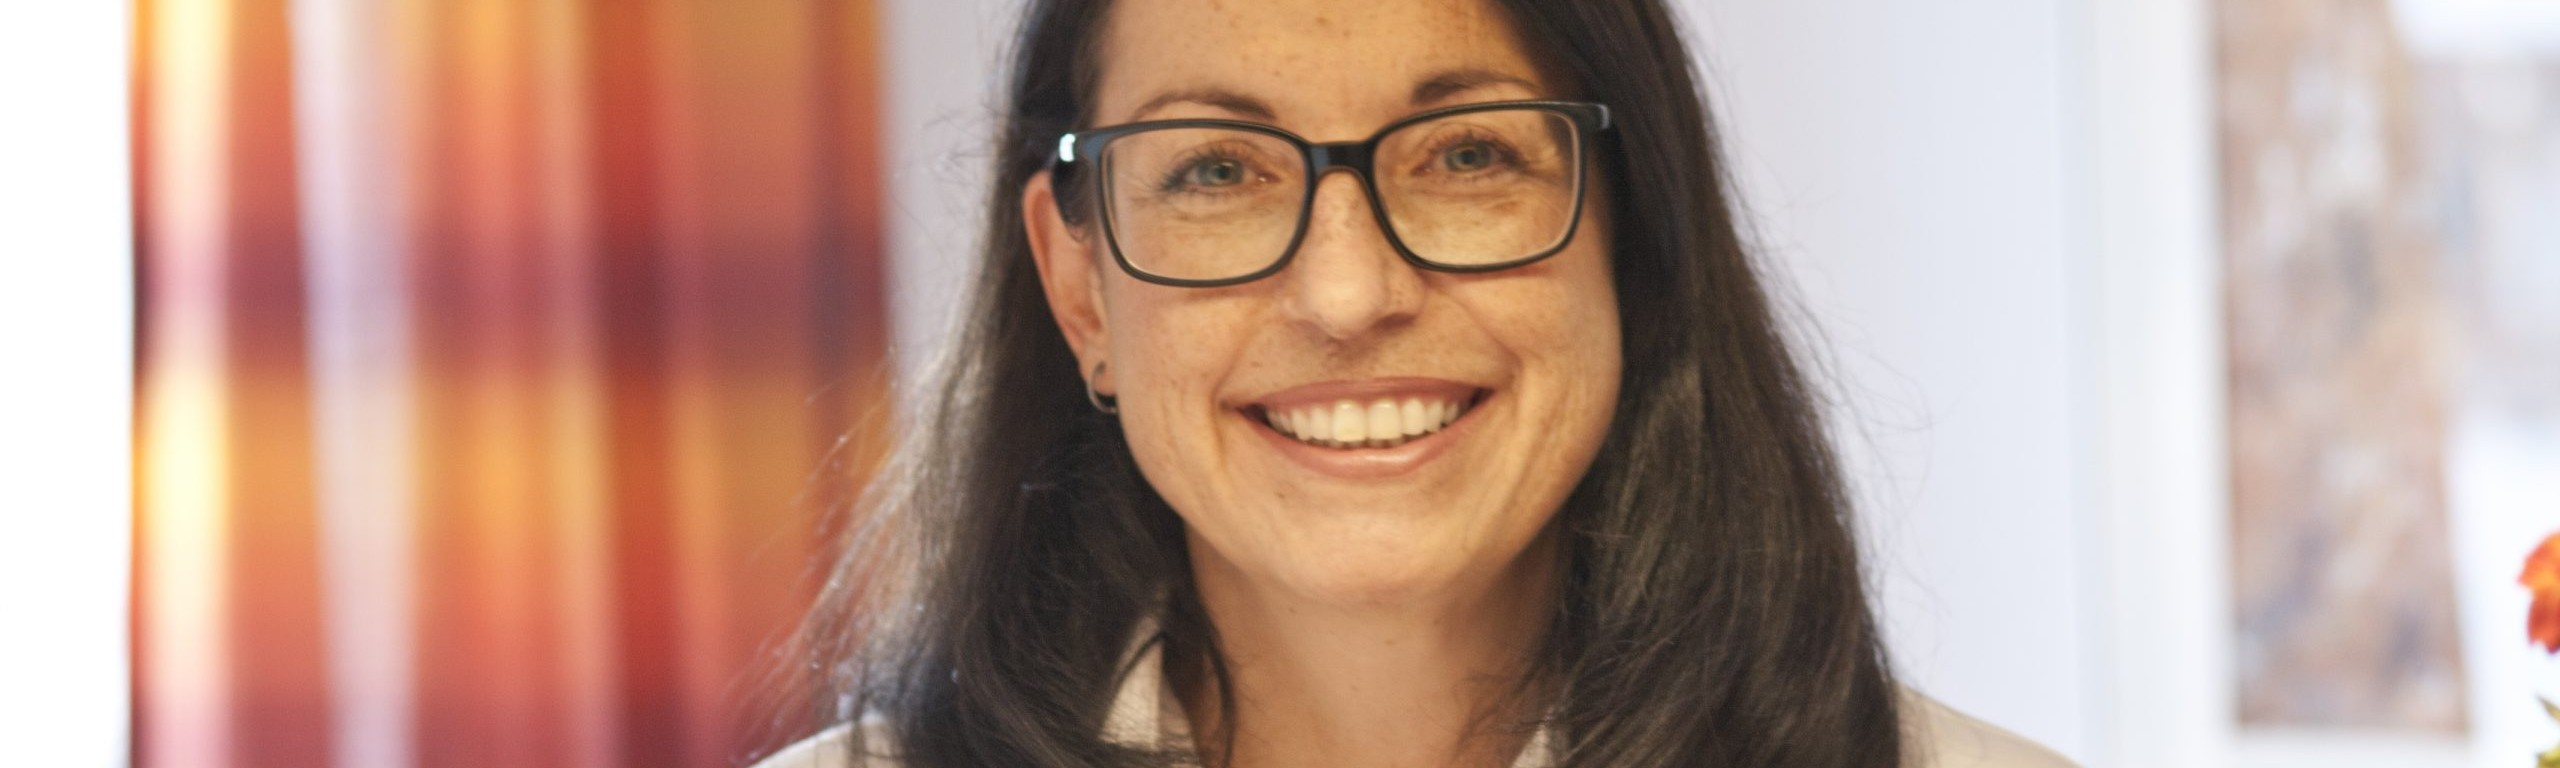 Frauenärztin Dr. Martina Lyding